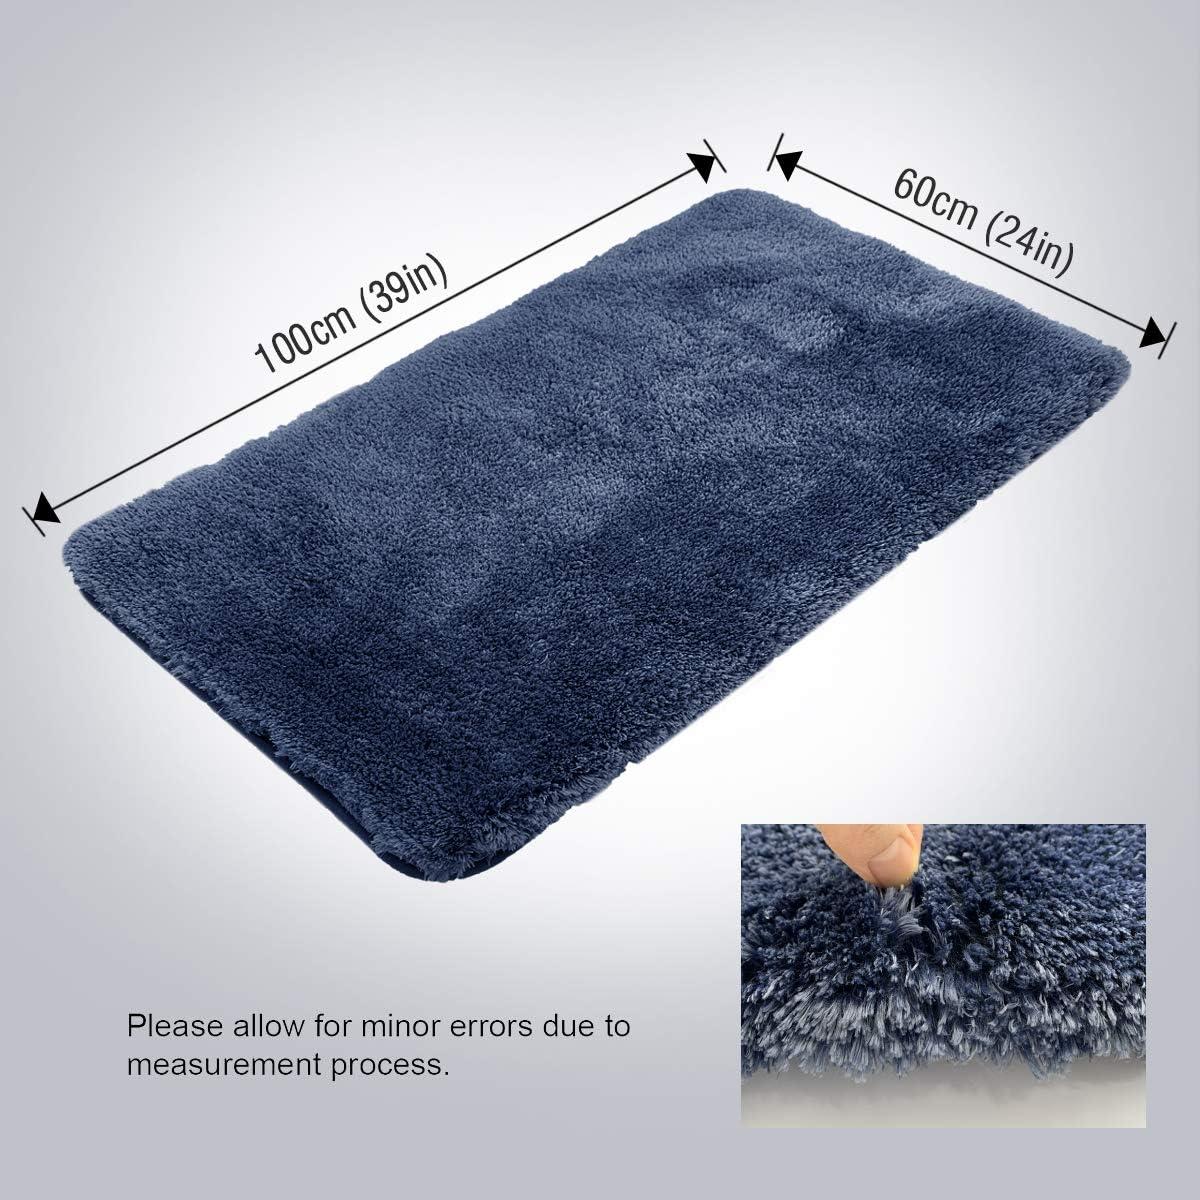 Machine Washable 50 x 80 cm Blue ITSOFT Non-Slip Bath Mat Water Absorbent Densely Woven Shaggy Soft Microfibers Bathroom Mat